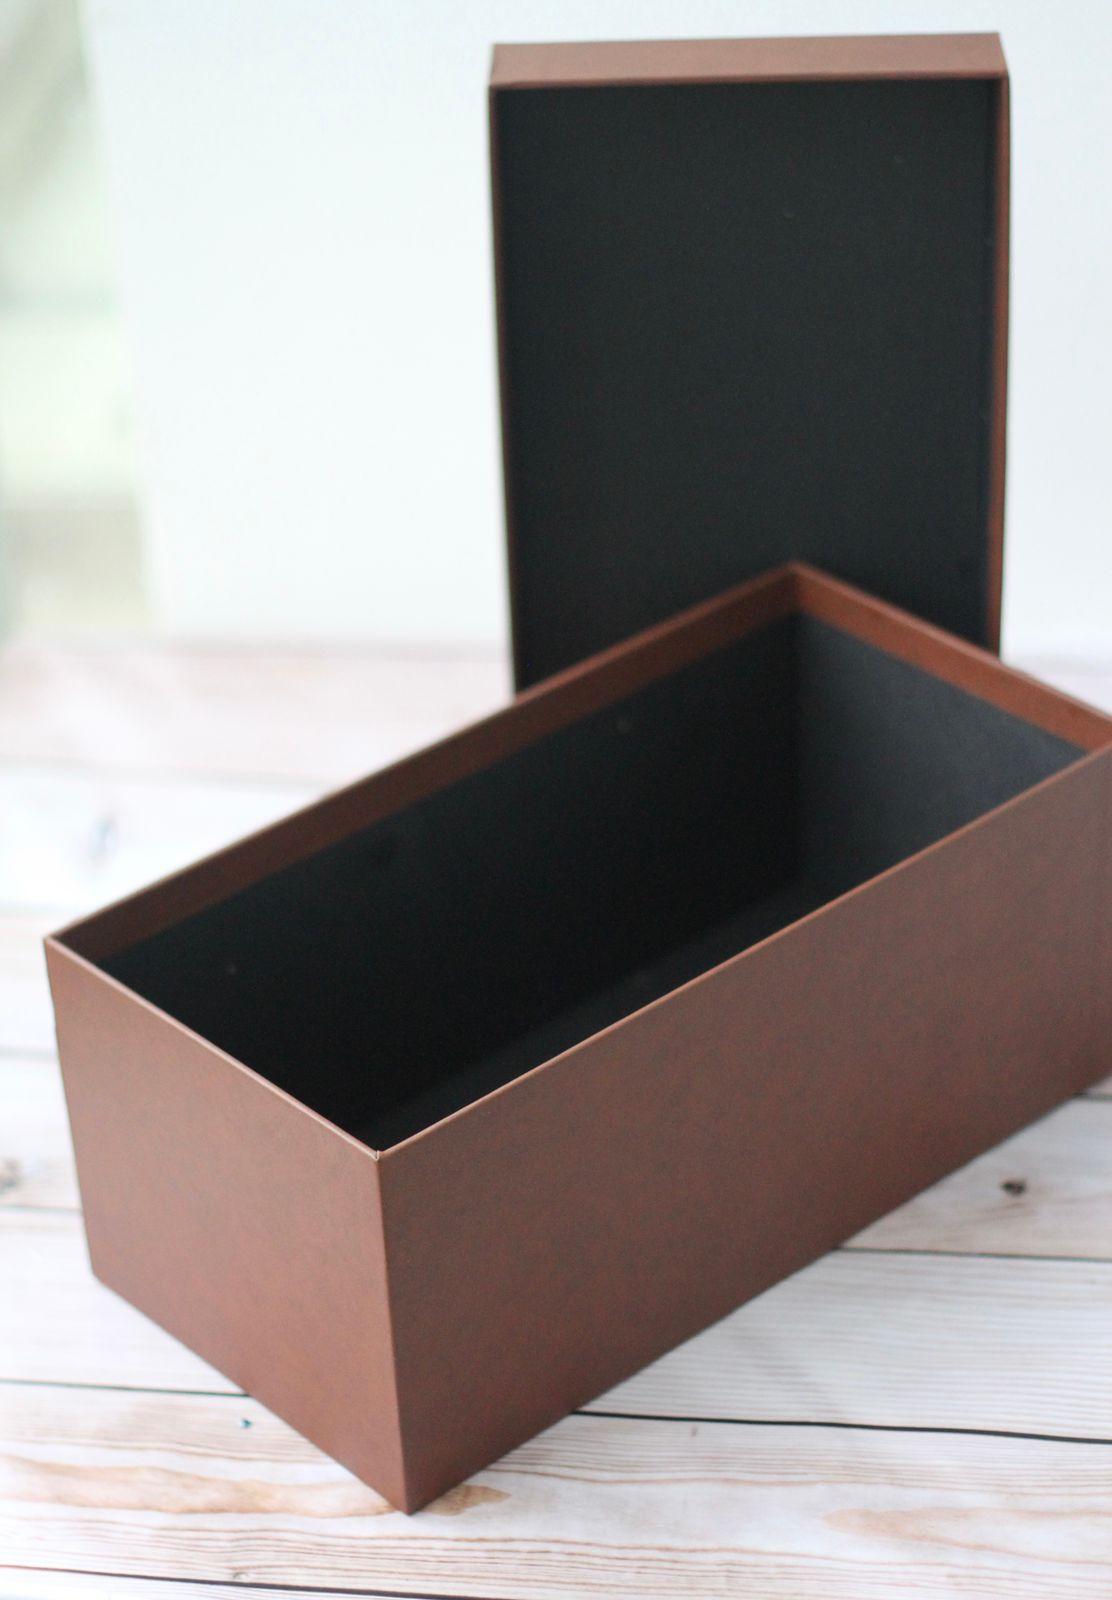 SHOE BOX – 12 x 6 x 5 inches